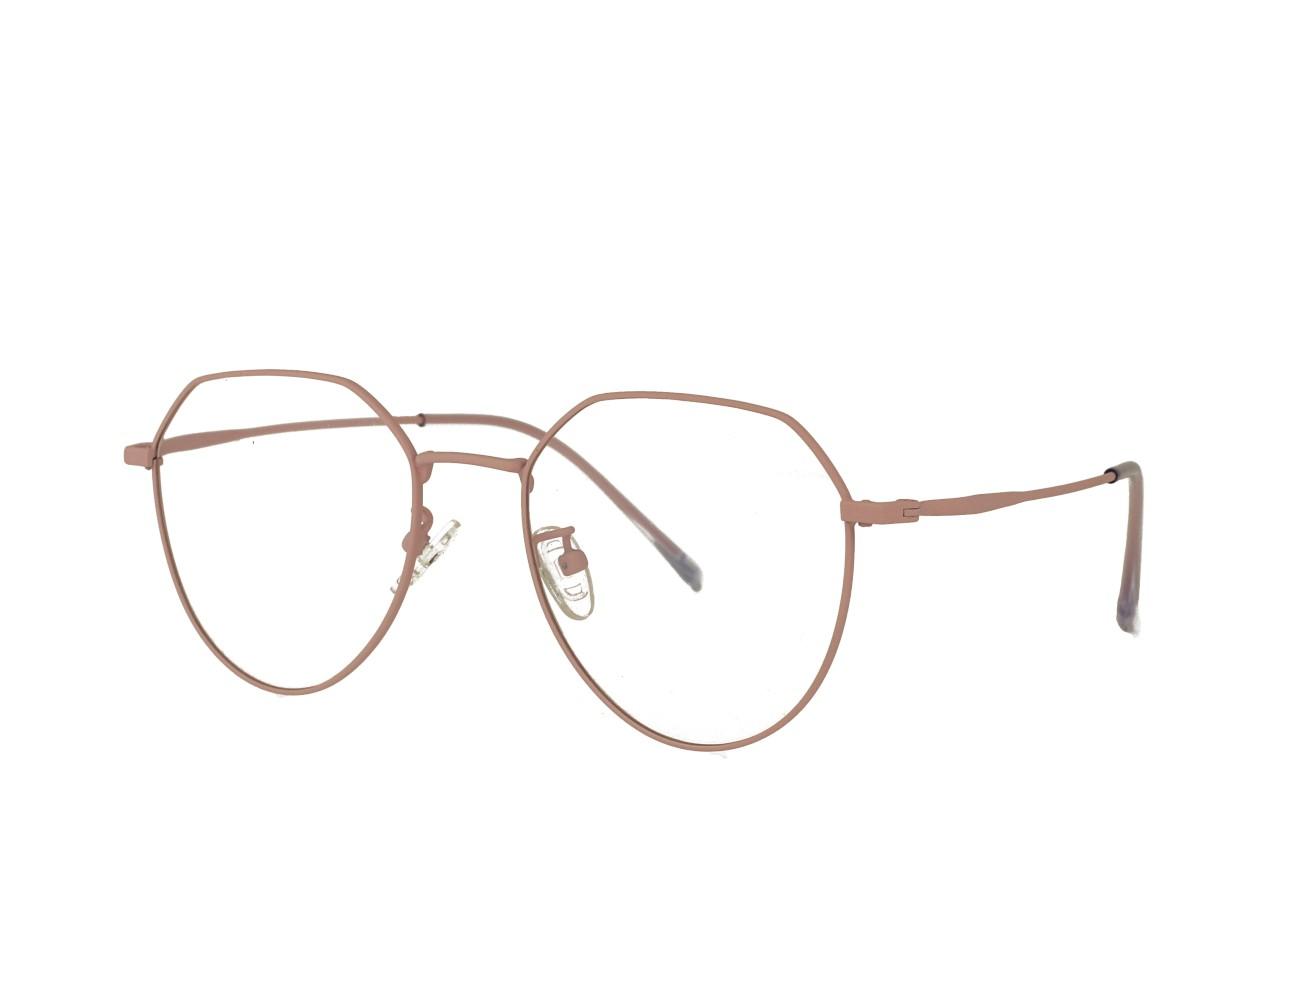 55 size HexagonUnisex Retro Optical frame Vintage Eyeglasses Supplier